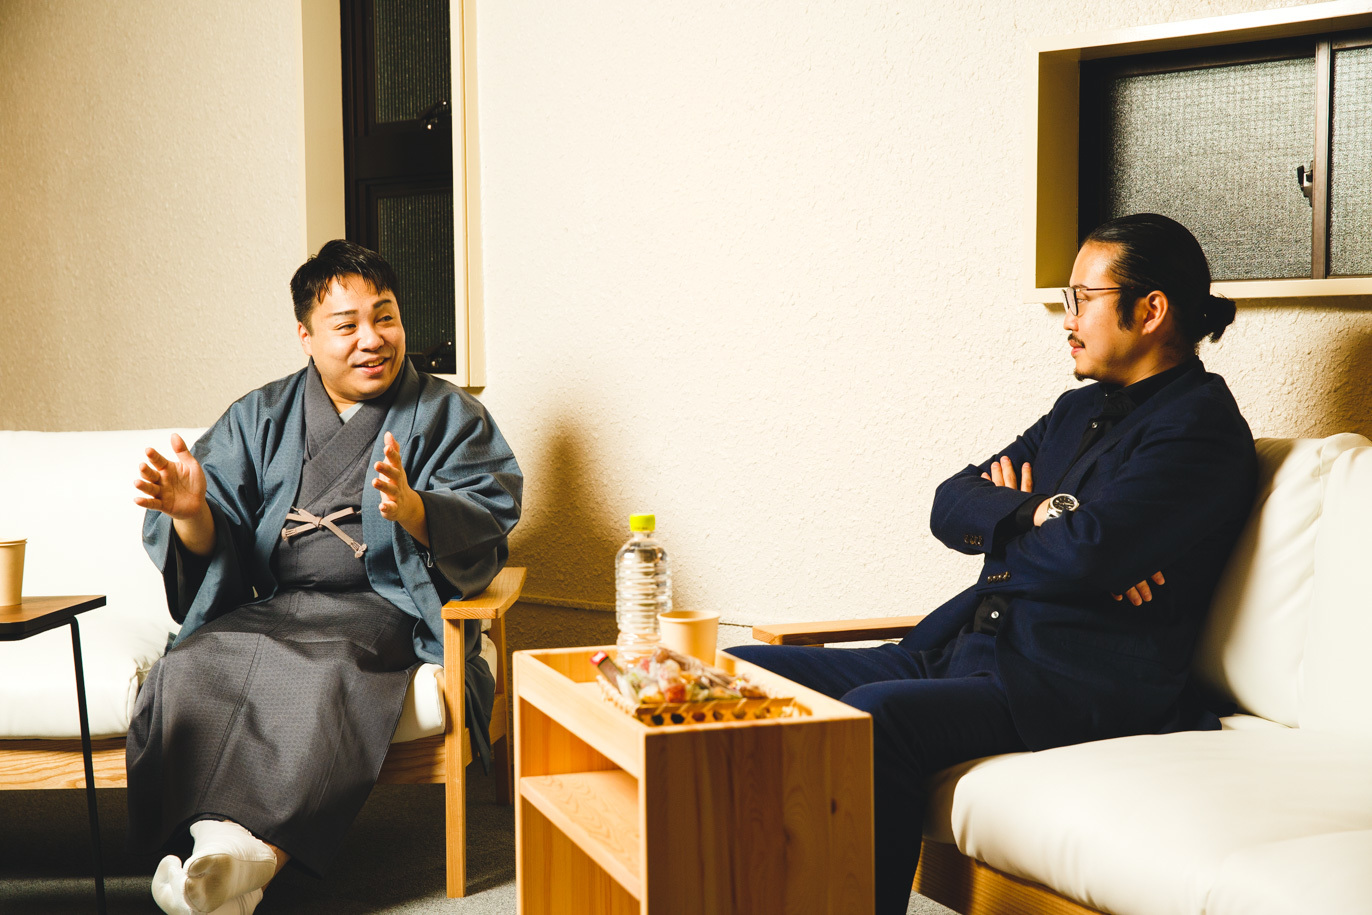 藤間勘十郎(舞踊家)×反田恭平(ピアニスト)